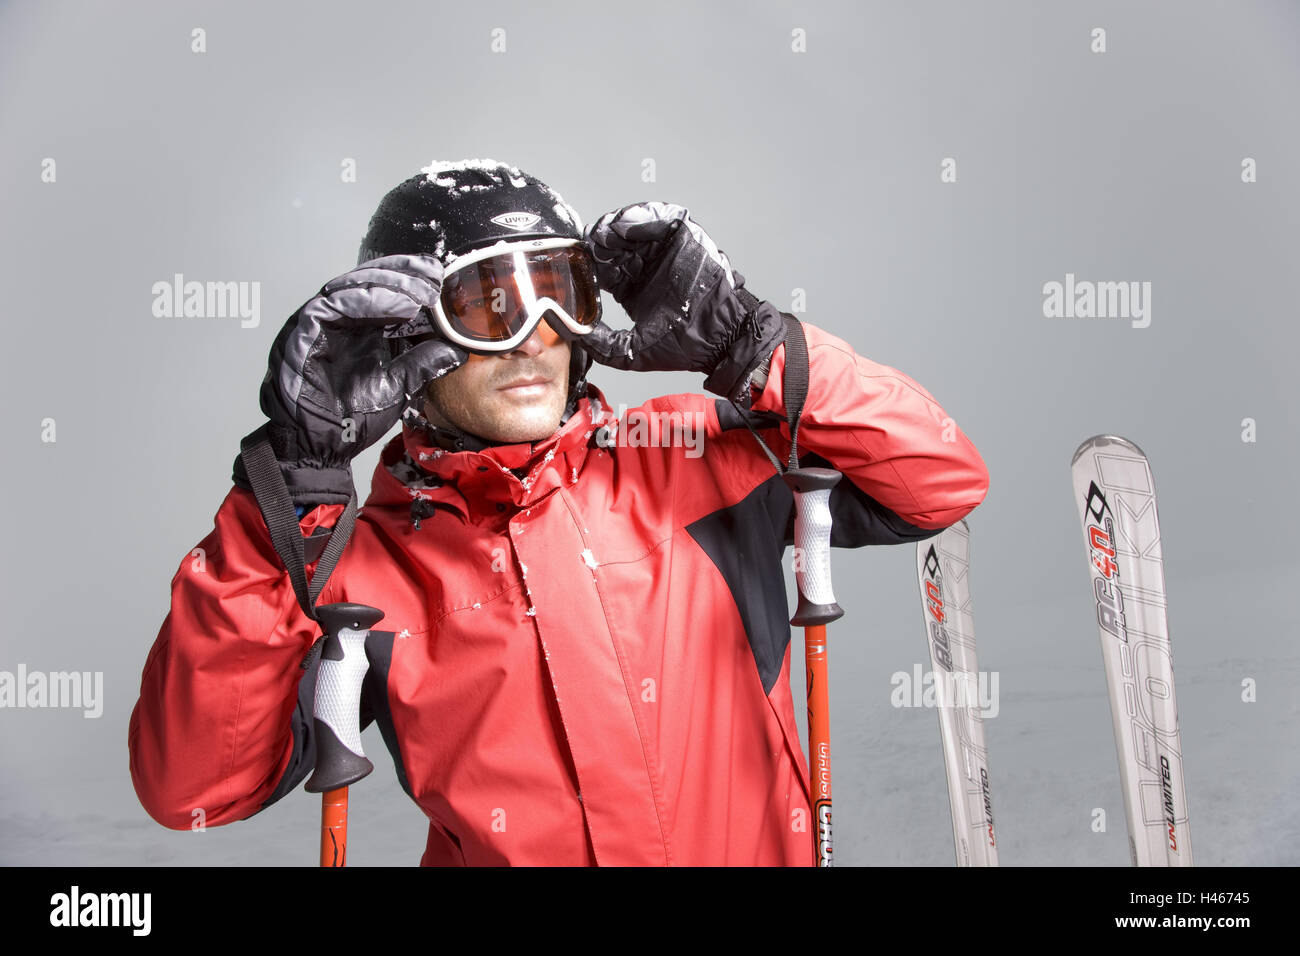 Man, skiwear, portrait, - Stock Image